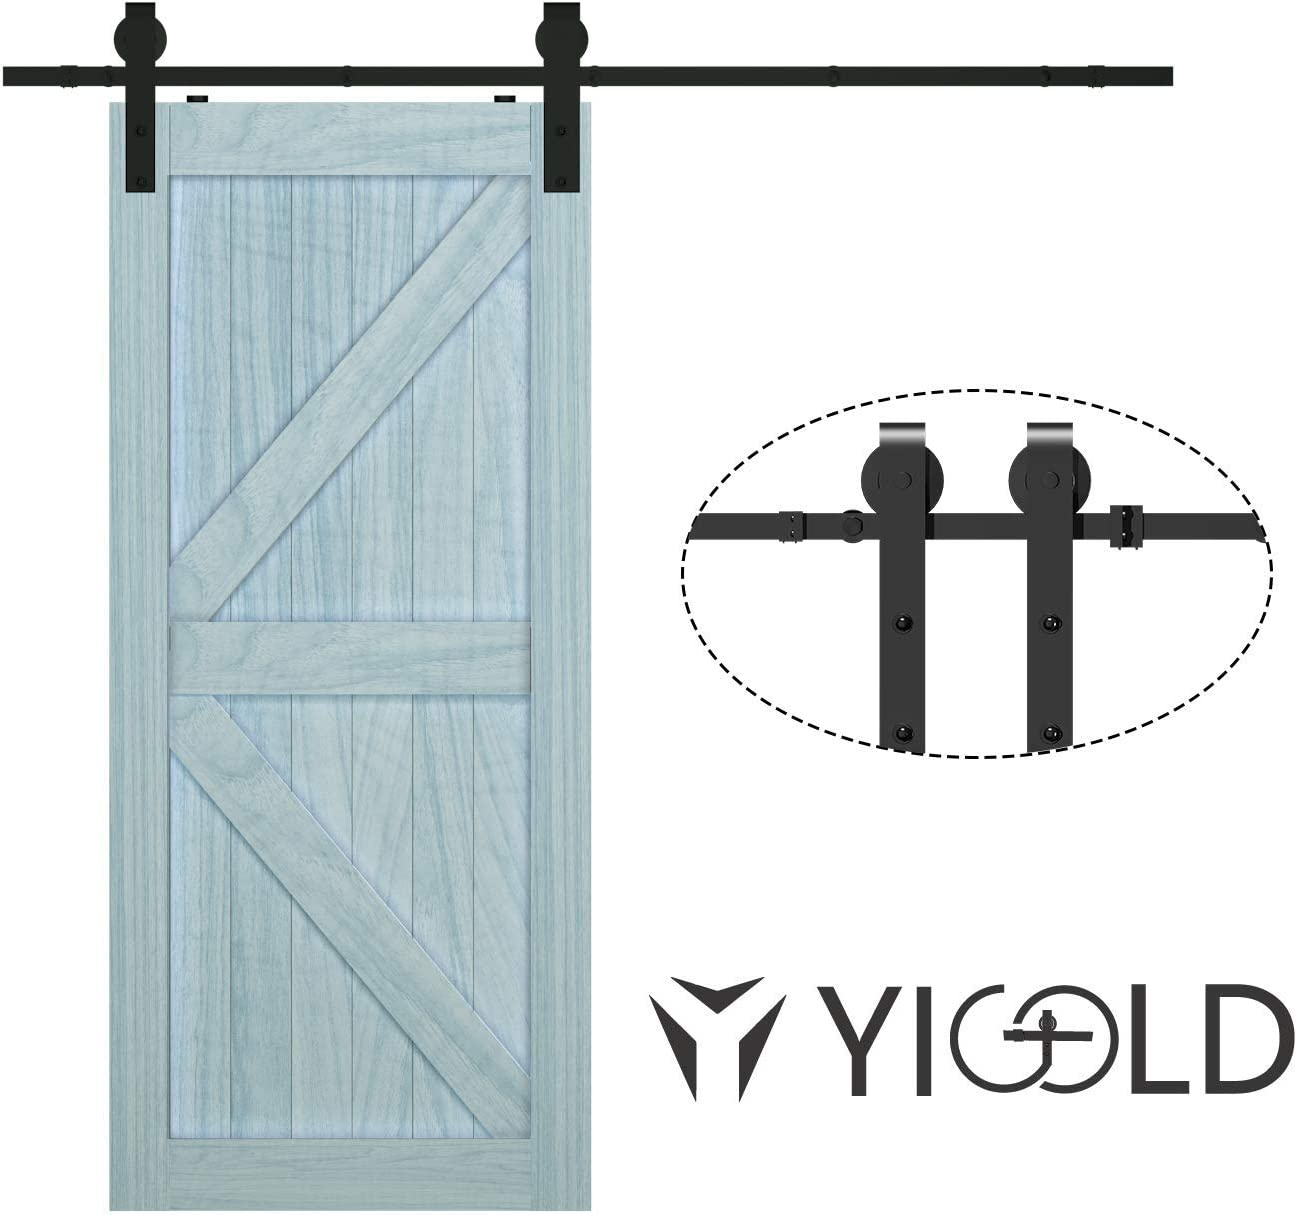 10ft Sliding Barn Door Hardware Kit,Hardware for Barn Doors Antique Style,Slide Smoothly Quietly,Factory Outlet Upgraded Version Quality Carbon Steel- J Shape Hanger,Double Door;Black